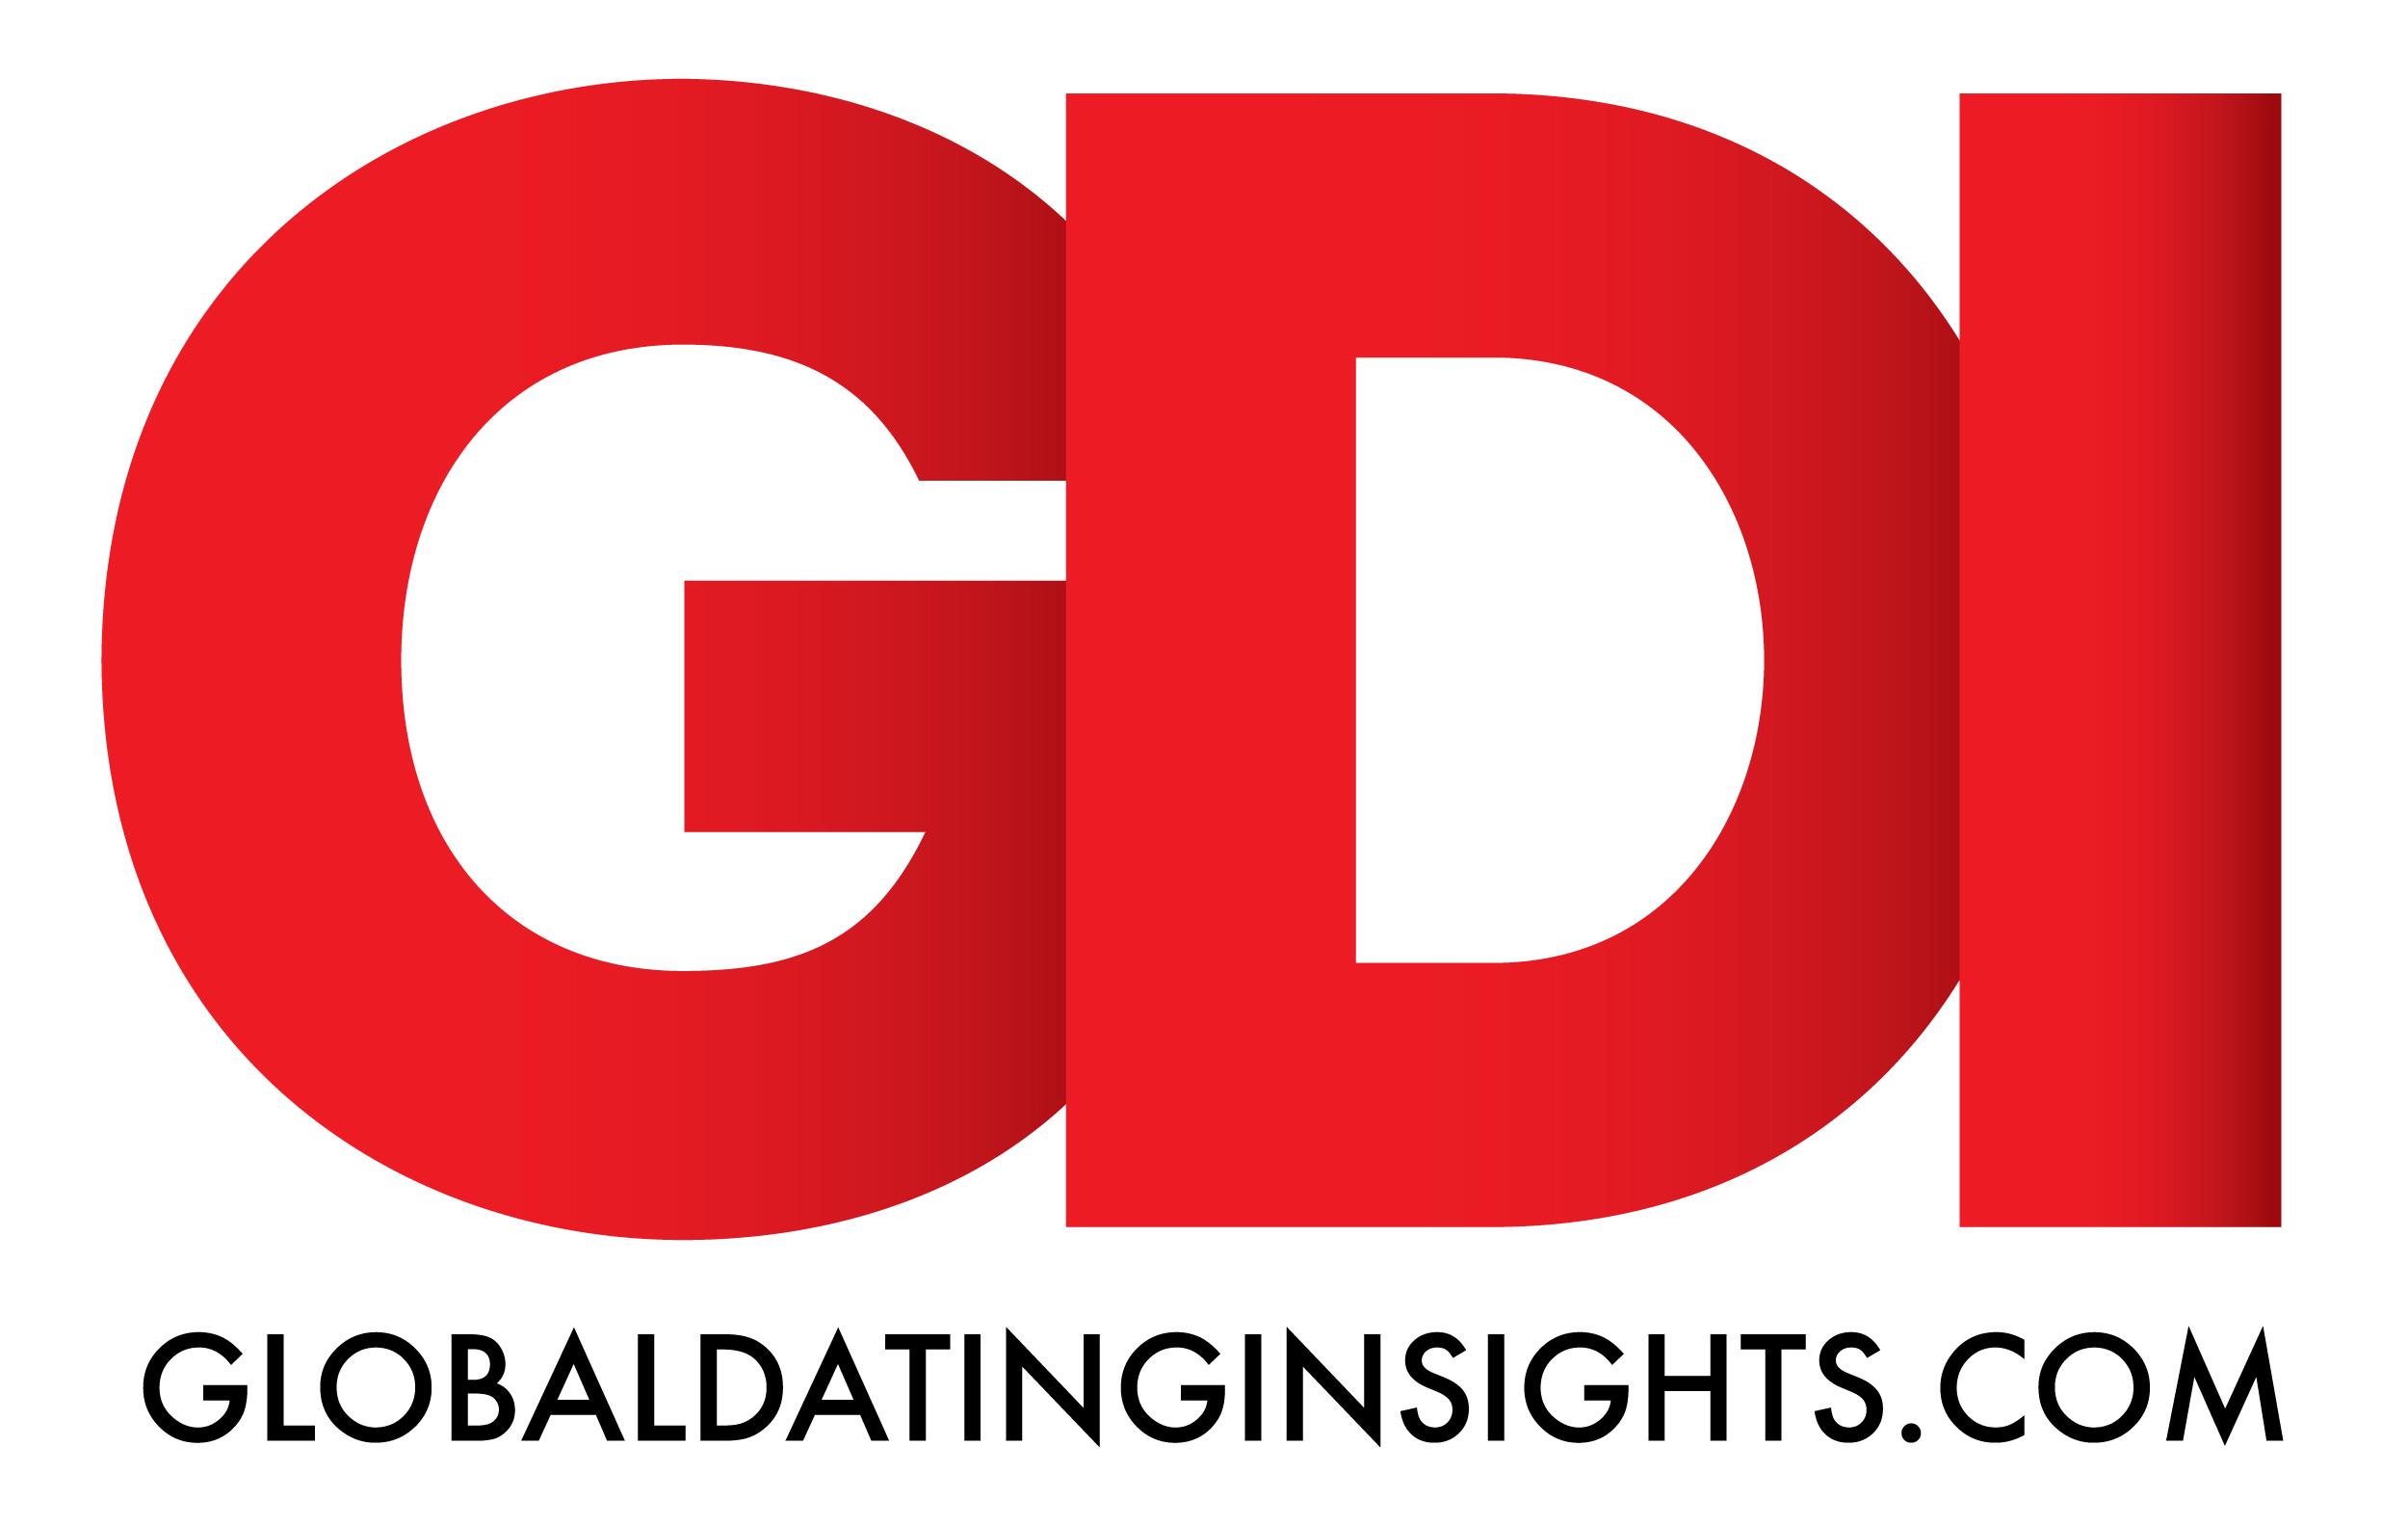 globaldatinginsights.com Logo